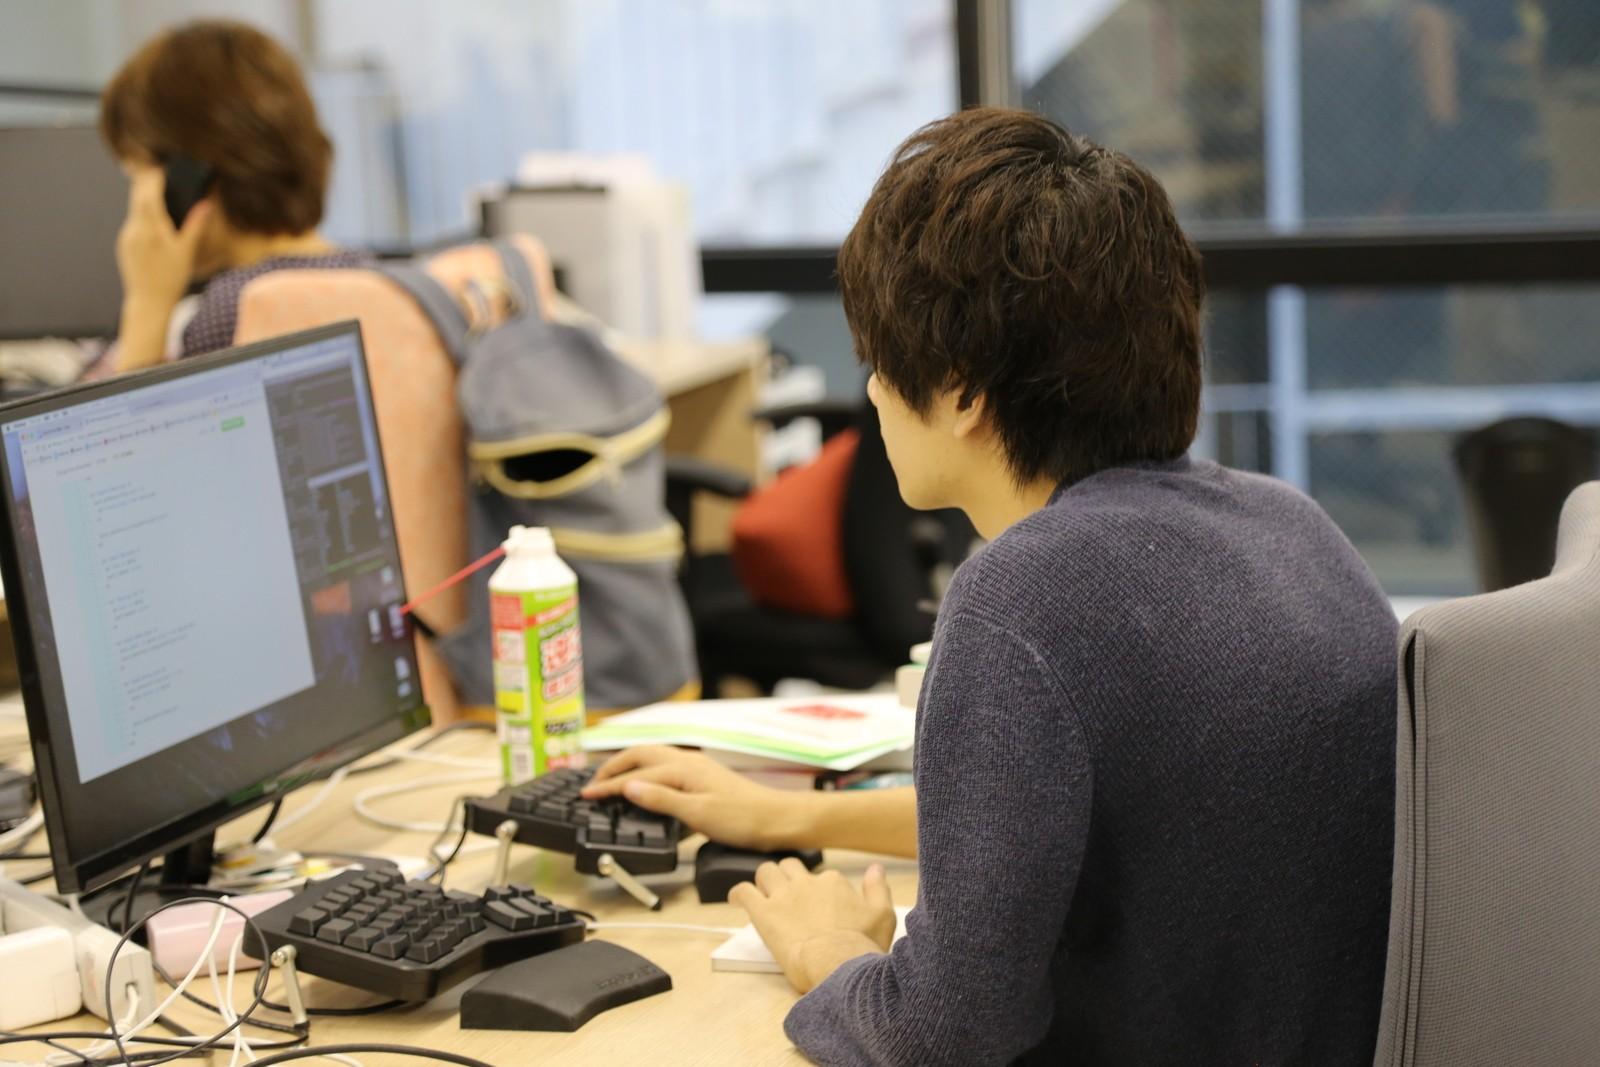 READYFOR株式会社・日本最大のクラウドファンディング「READYFOR」を開発するRailsエンジニアを募集!